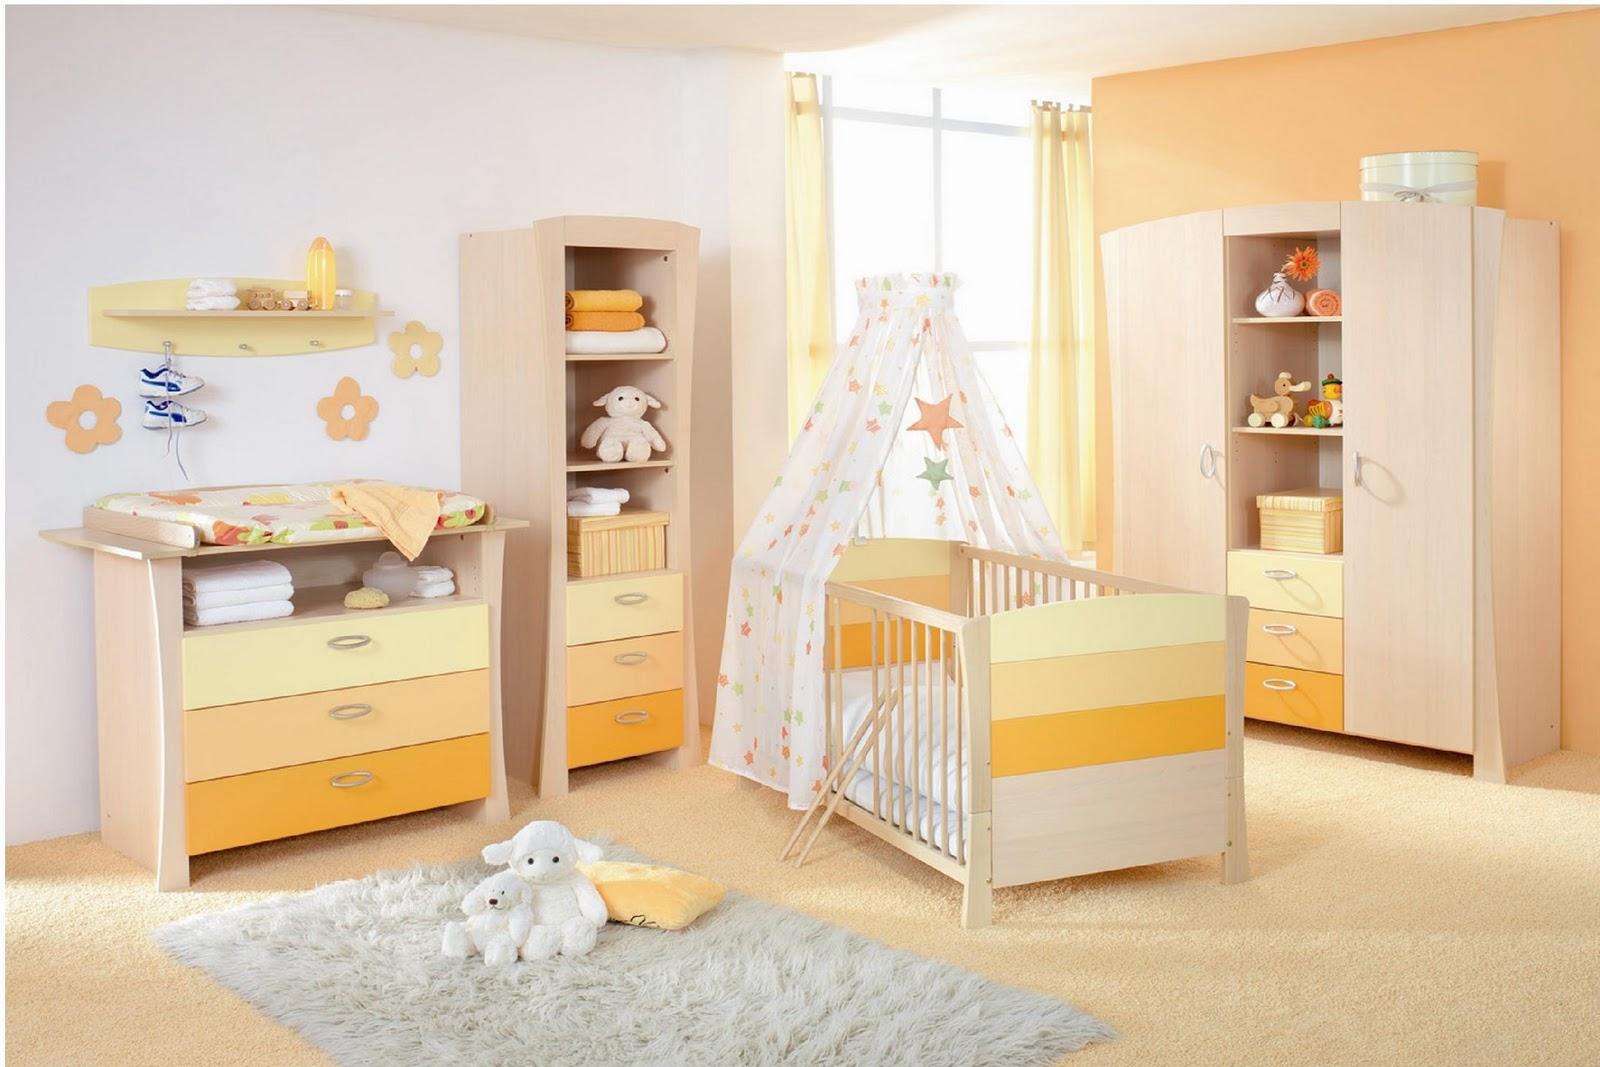 decorar-quarto-bebe-amarelo